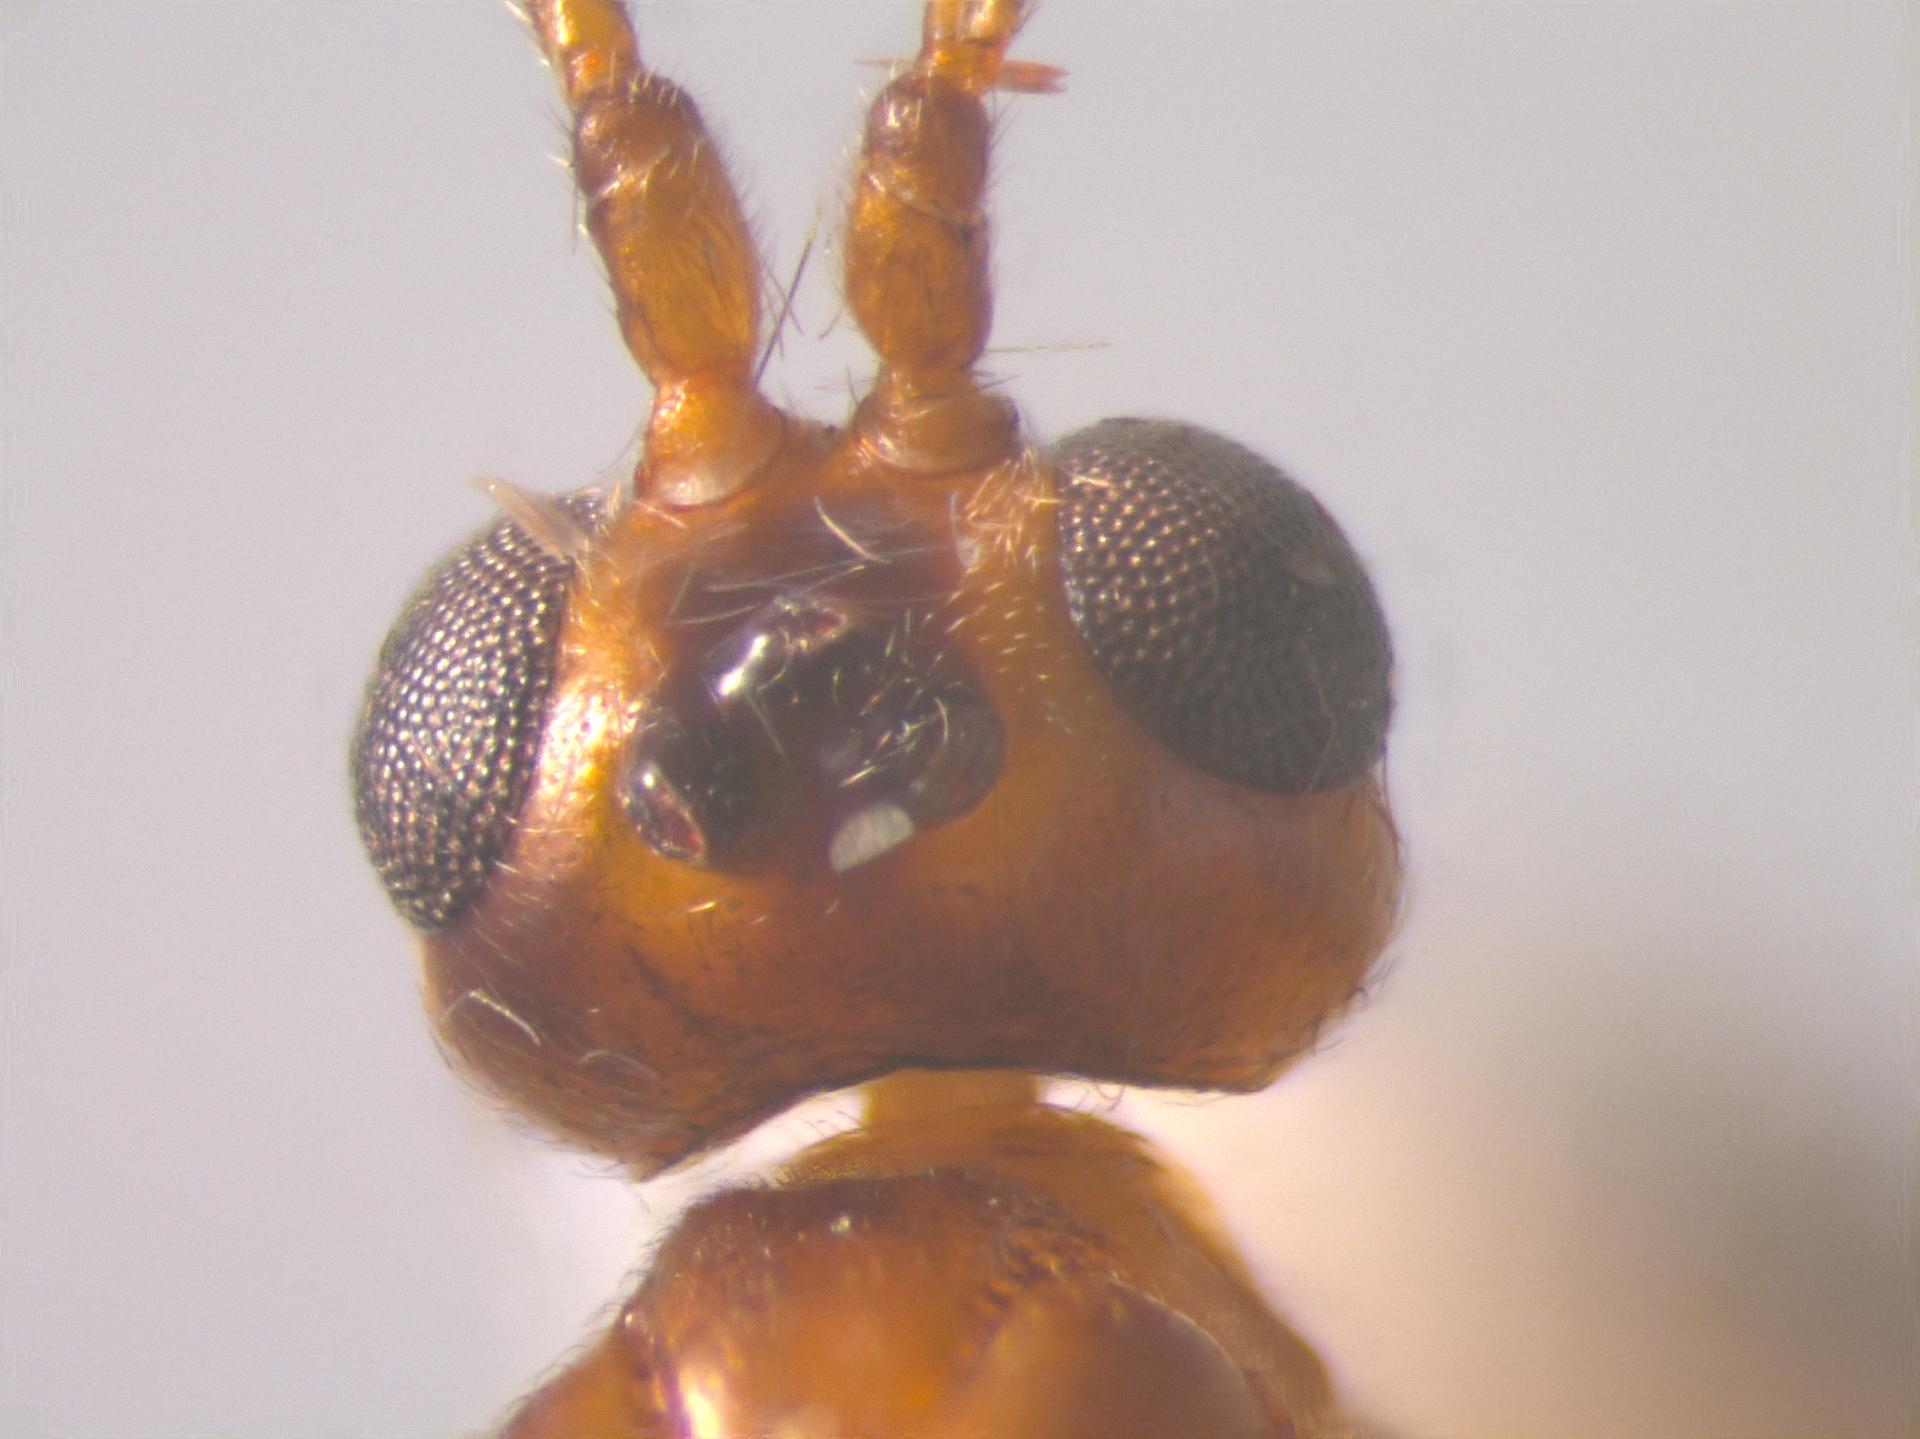 RMNH.INS.108896 | Leiophron falcatus Nees, 1834